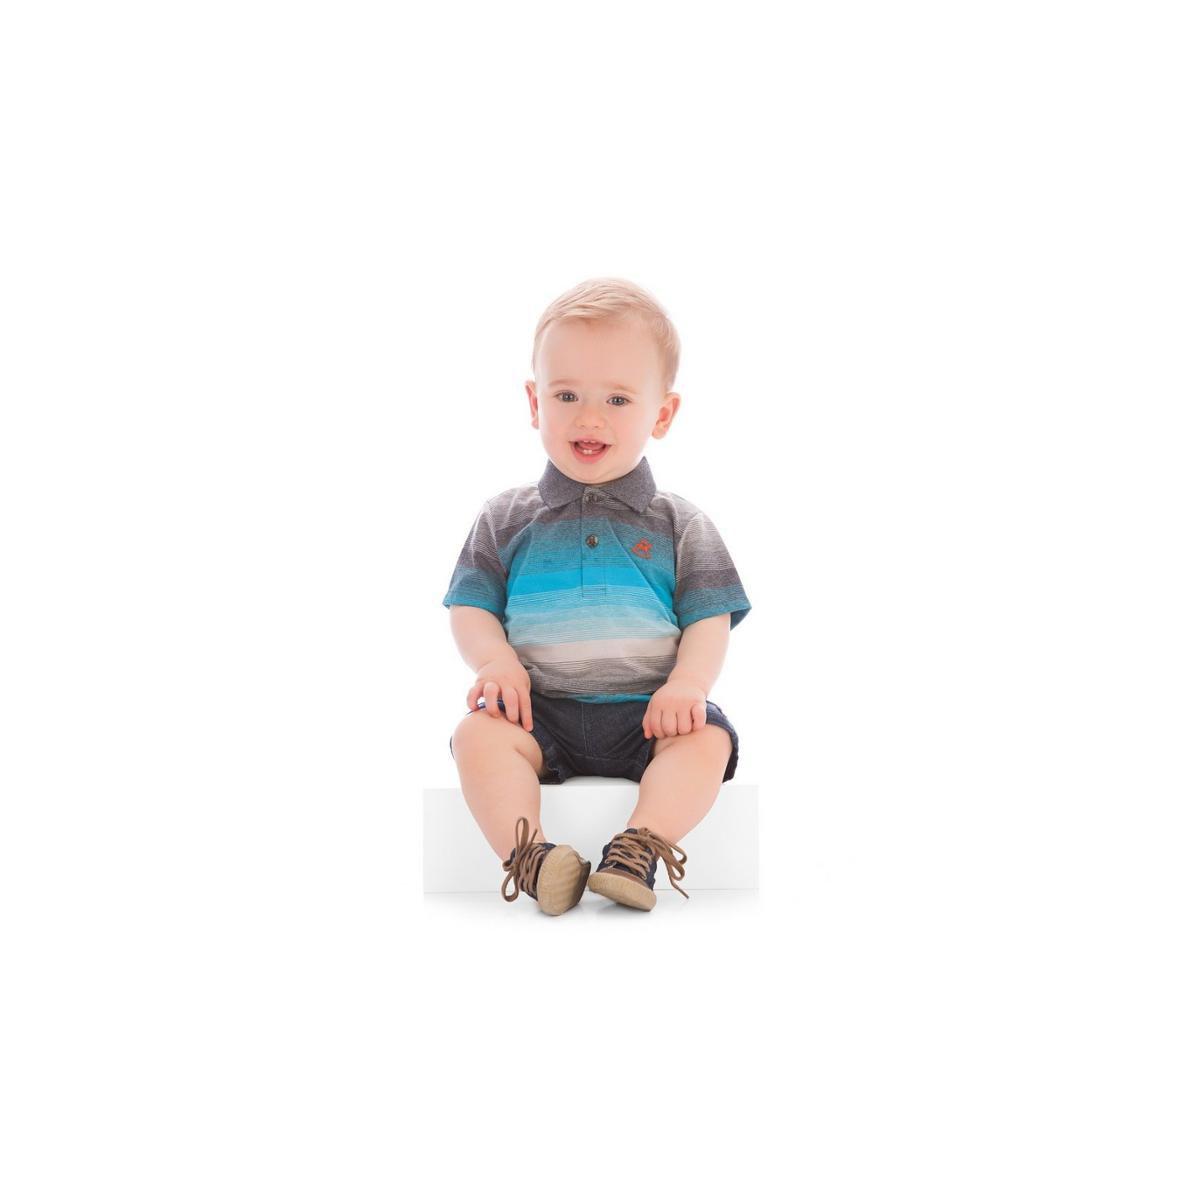 ad29f9a344 Camisa Polo Bebê Up Baby Masculina - Compre Agora